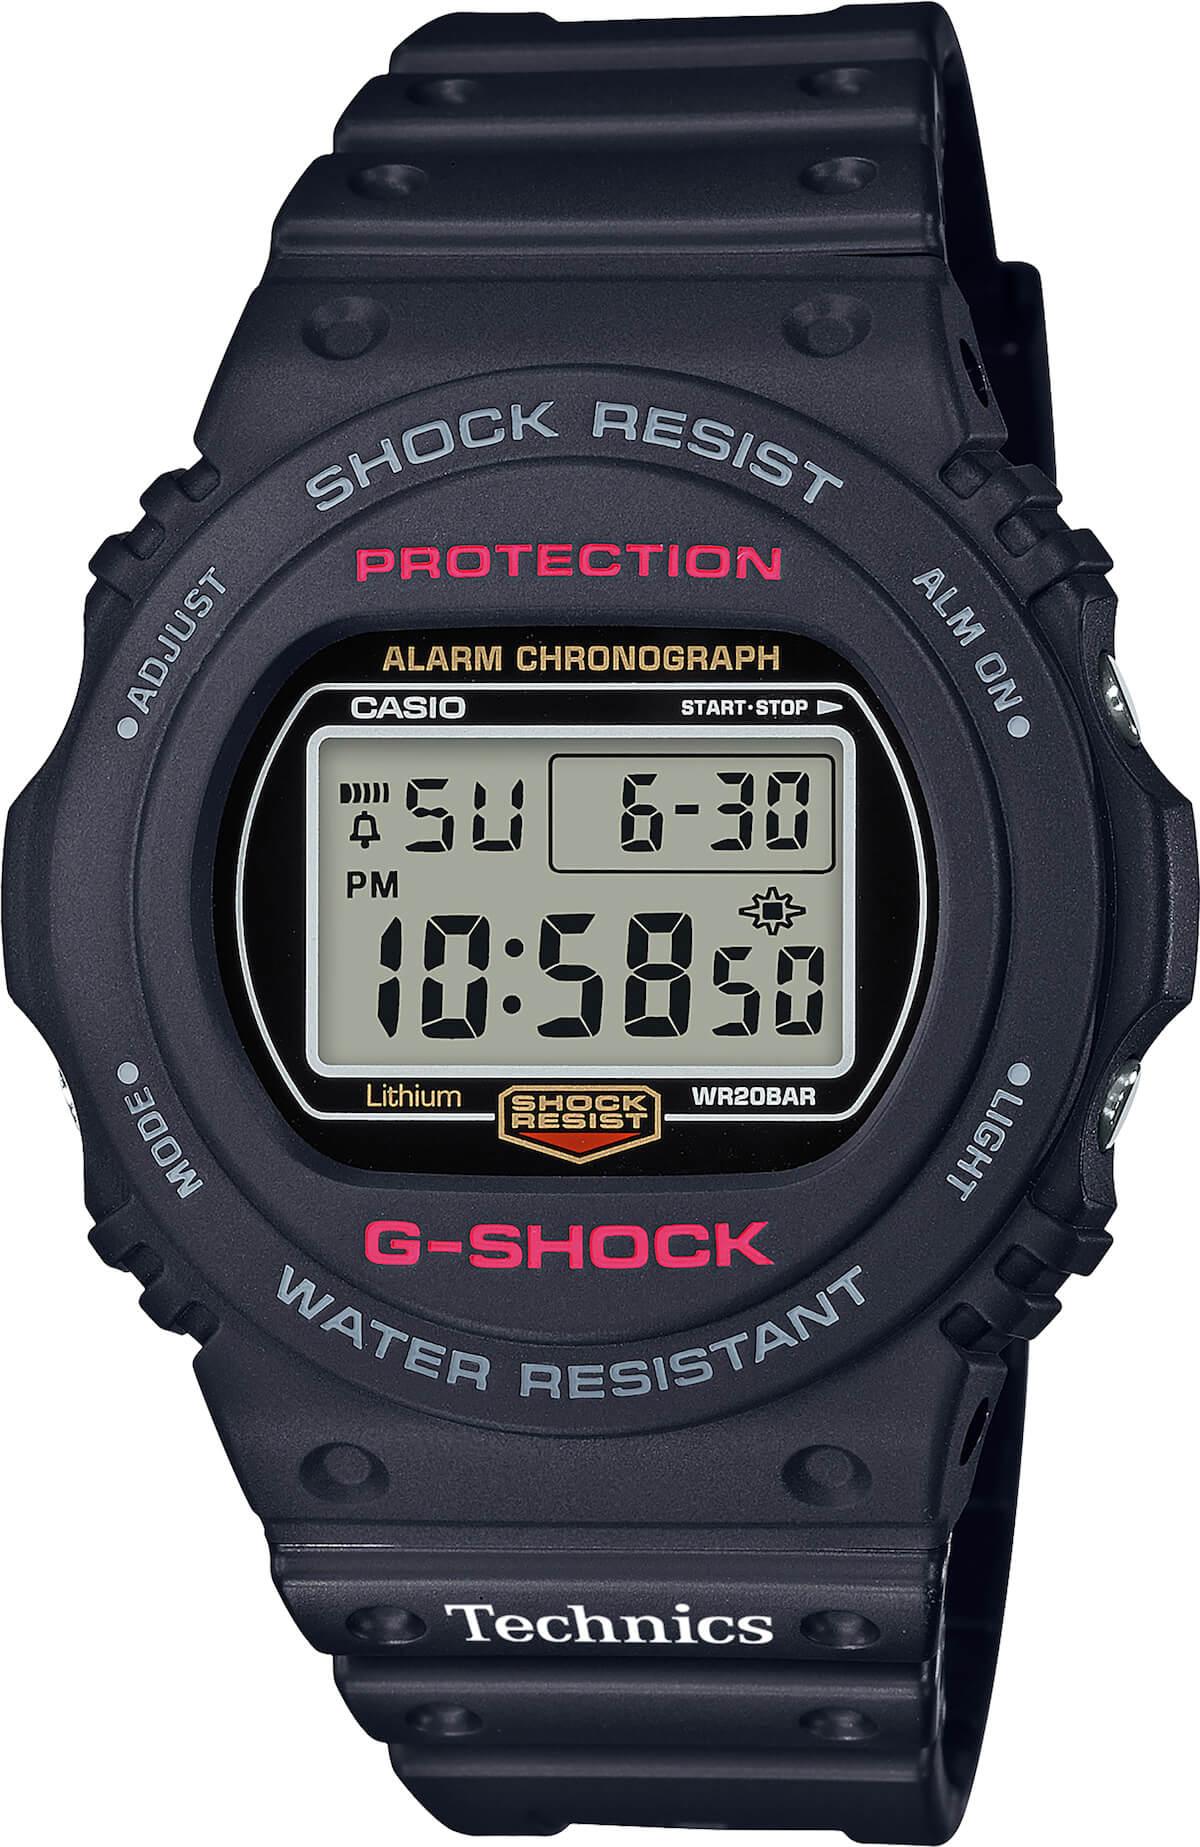 Technics「SLー1200MK7」購入キャンペーン!2台購入でTechnicsロゴ入りGーSHOCKプレゼント tech190520_technics_3